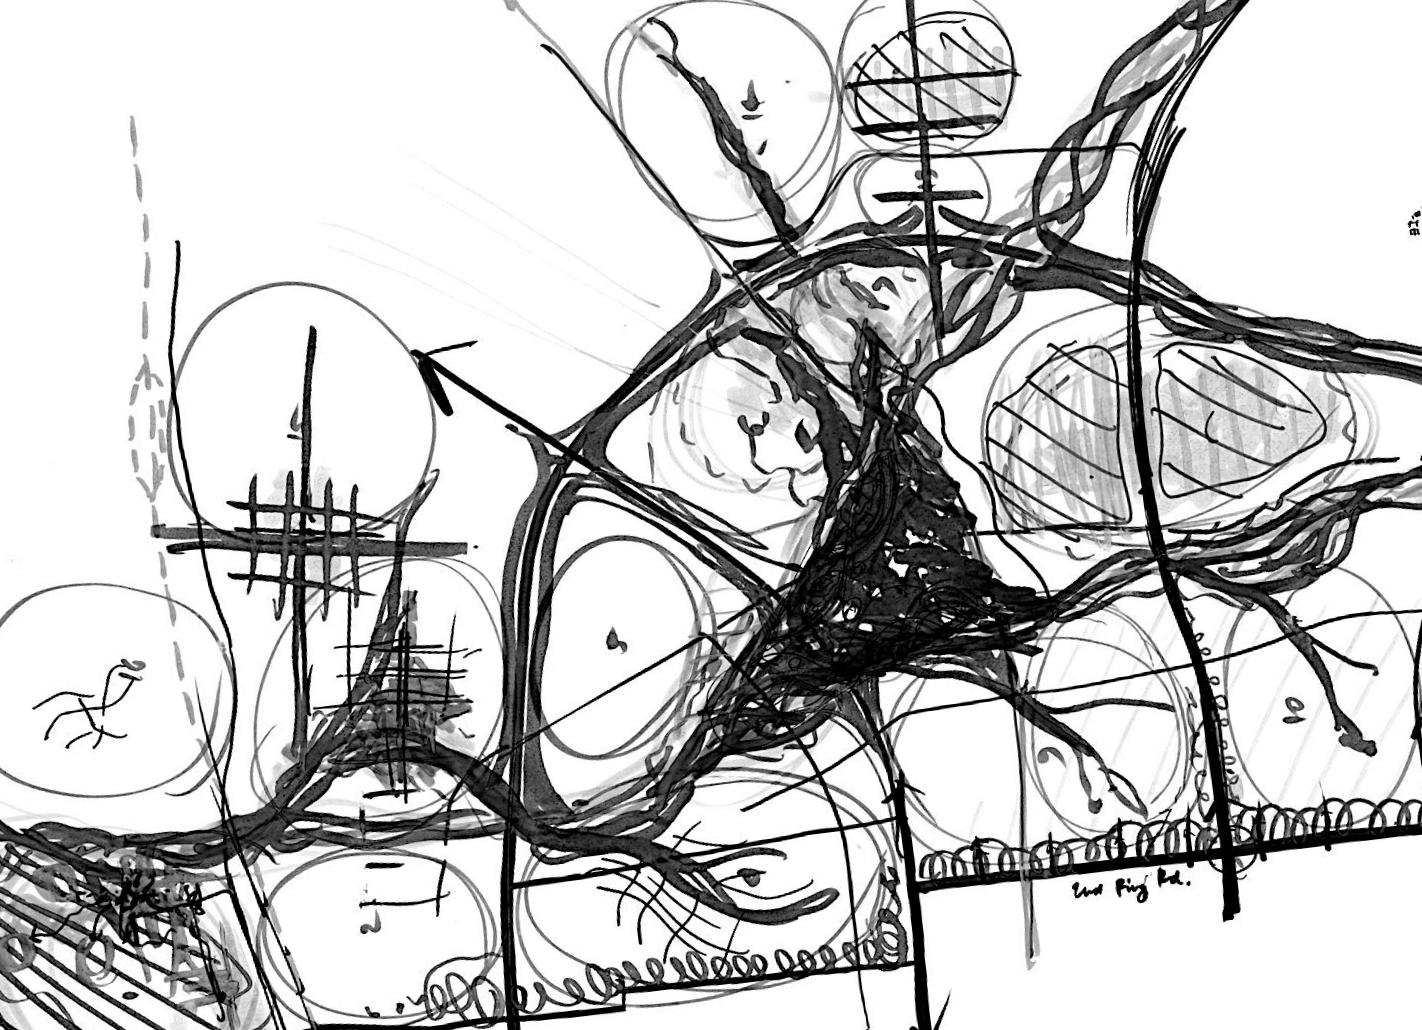 Conceptual Sketch Development